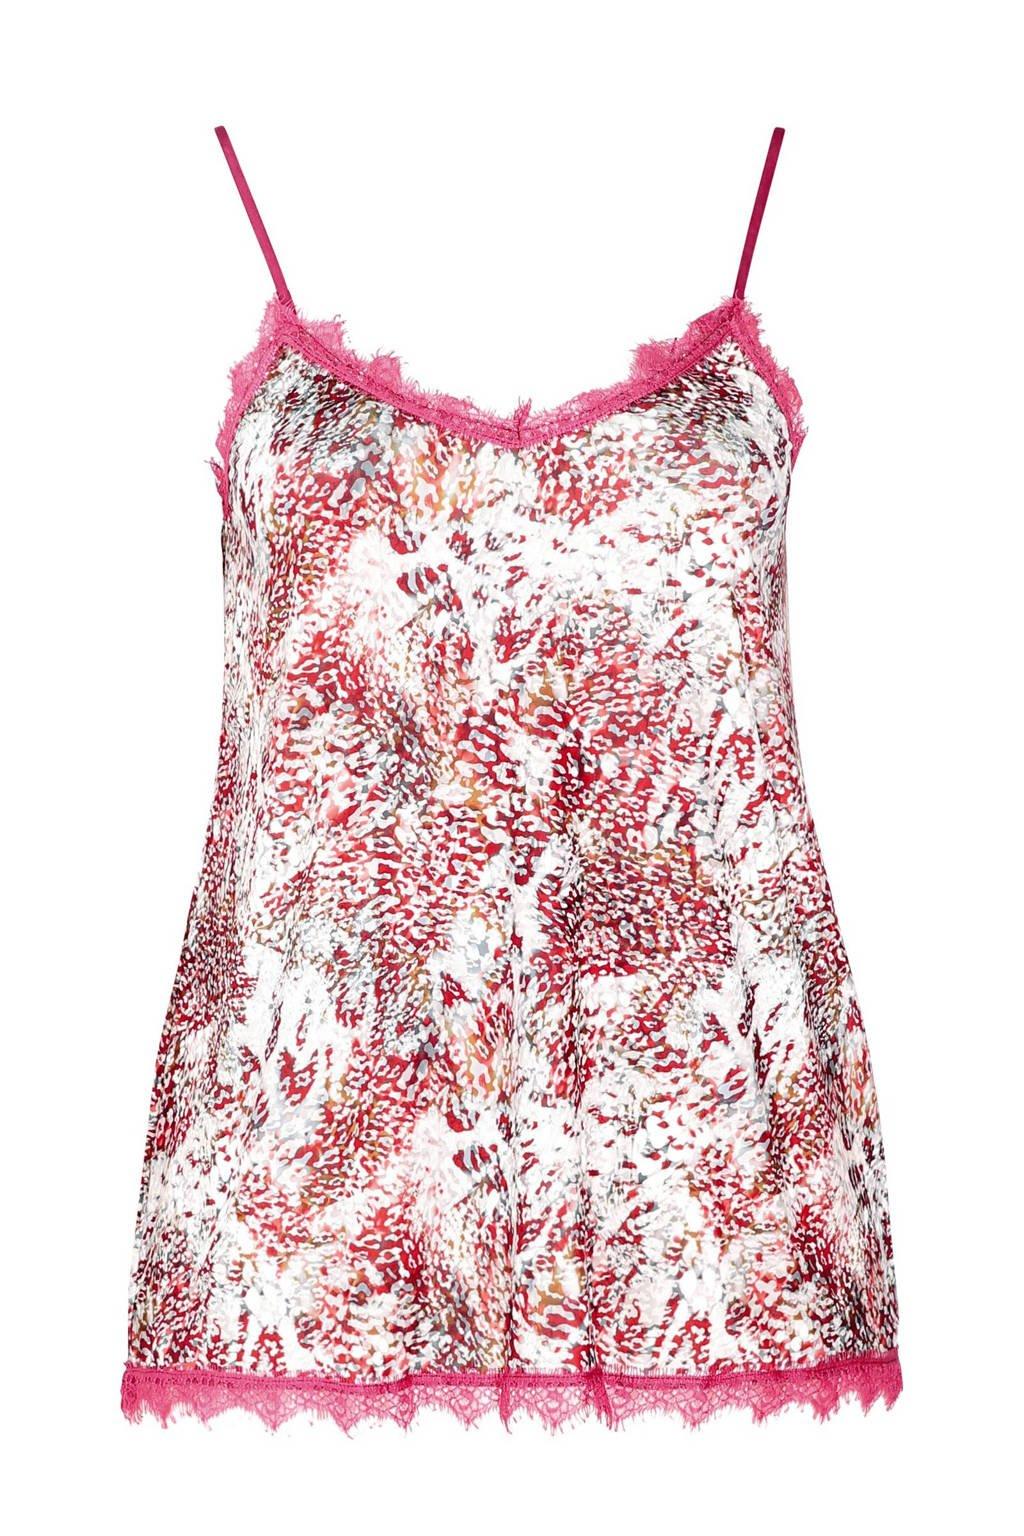 Paprika pyjamatop met all over print roze, Bordeaux